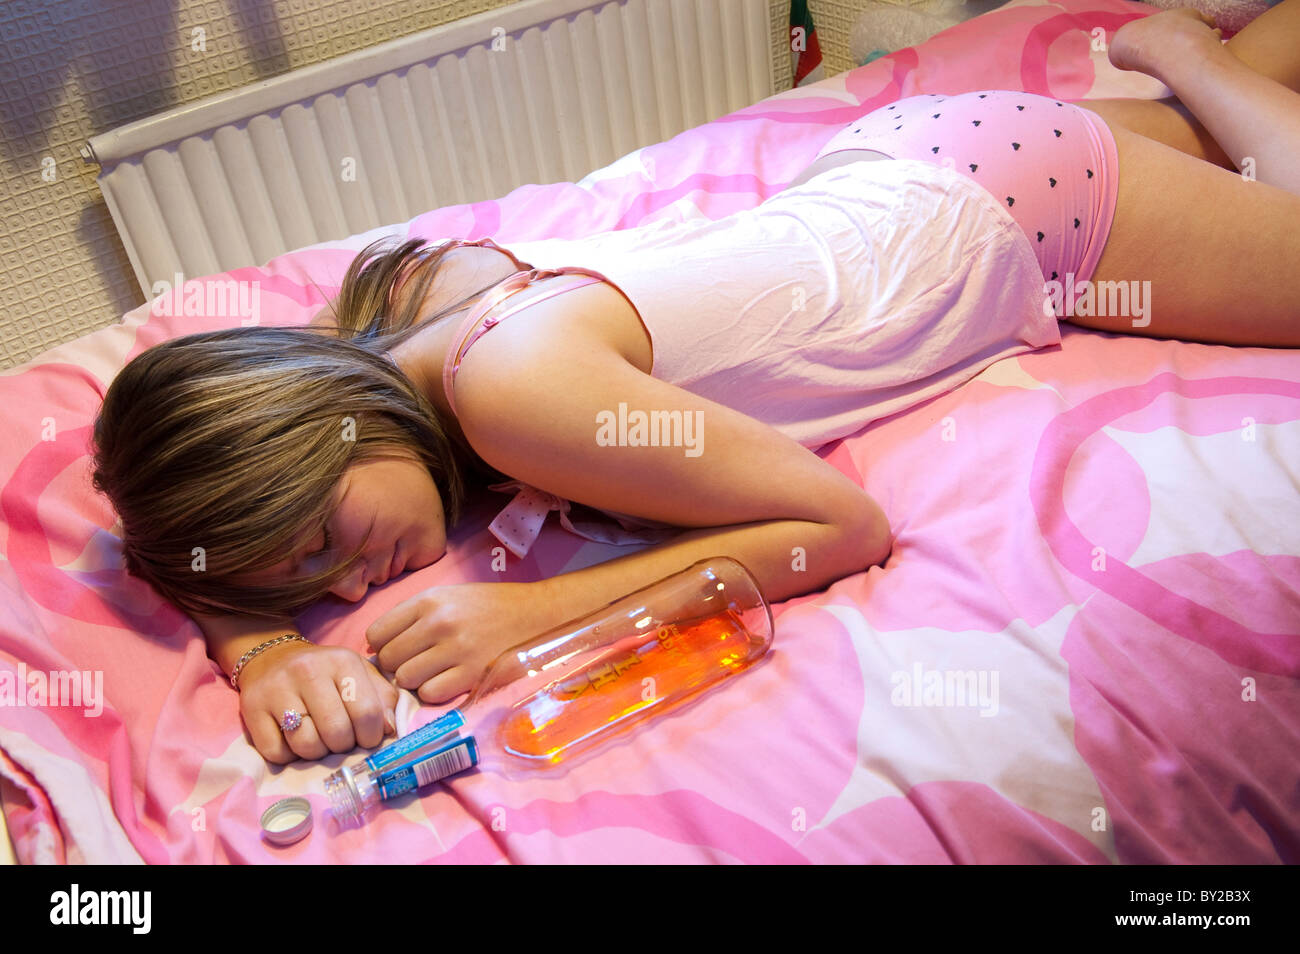 Asleep Teens Sex 18